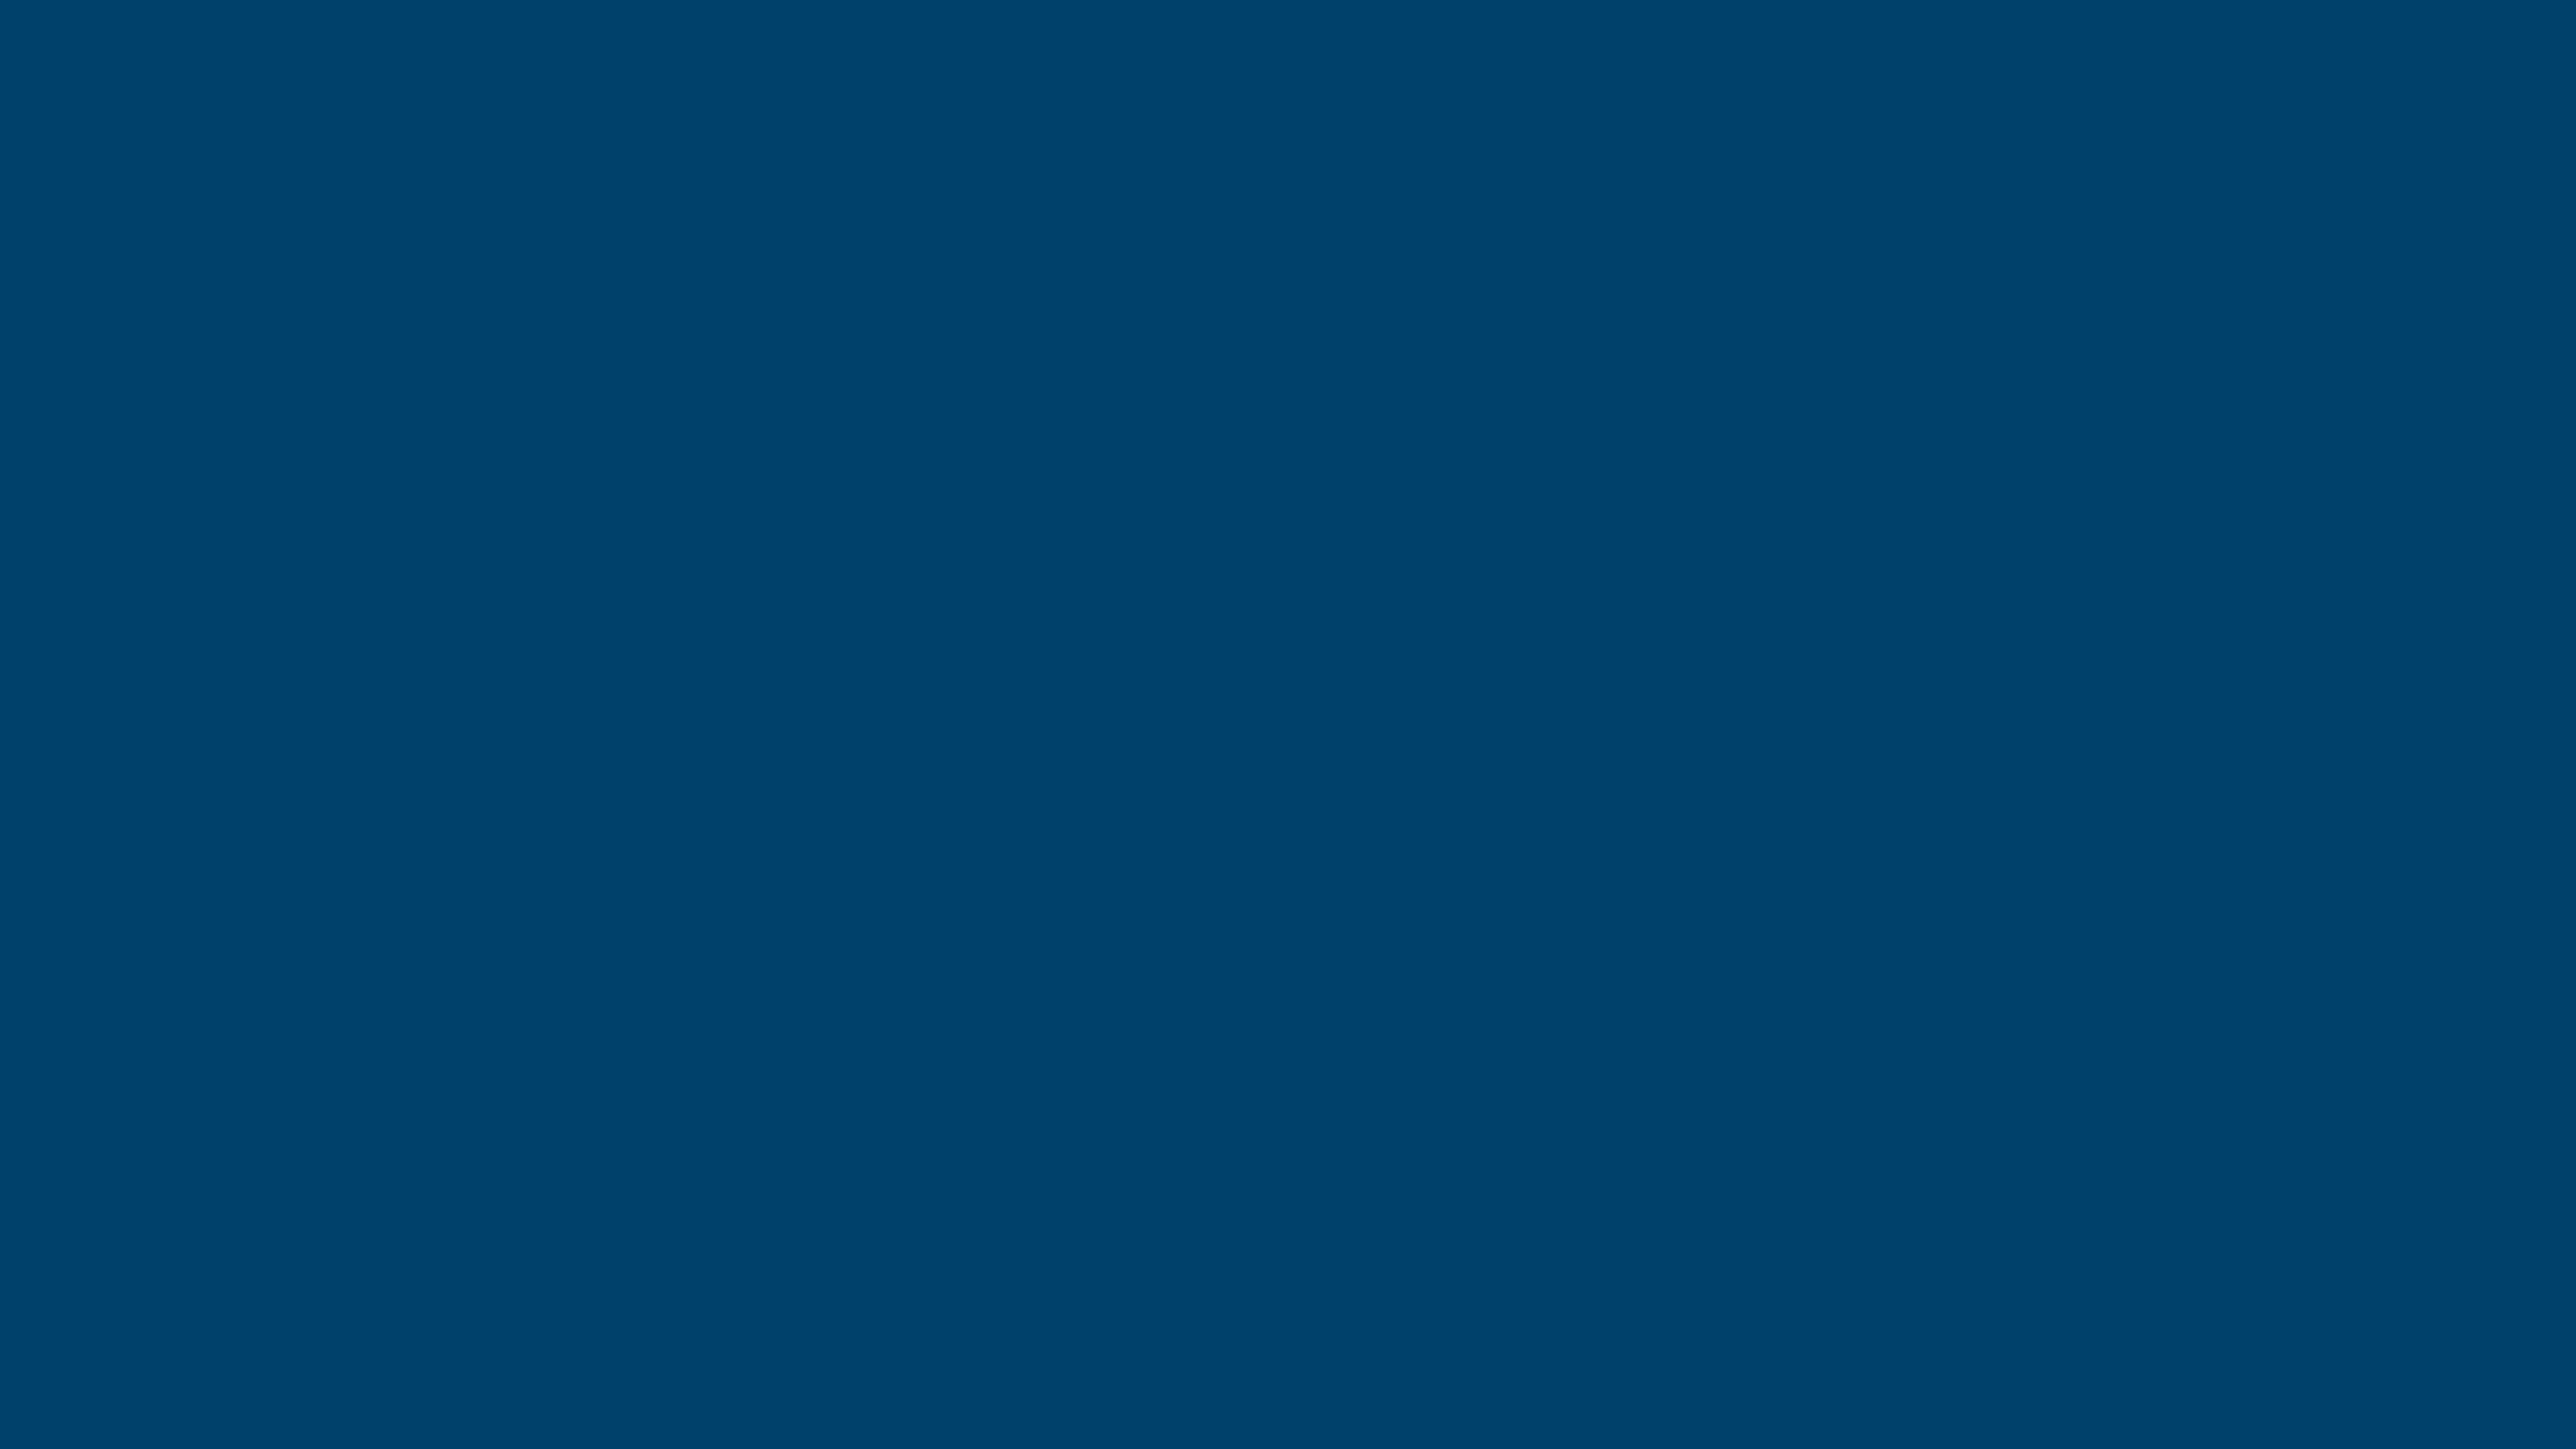 7680x4320 Indigo Dye Solid Color Background